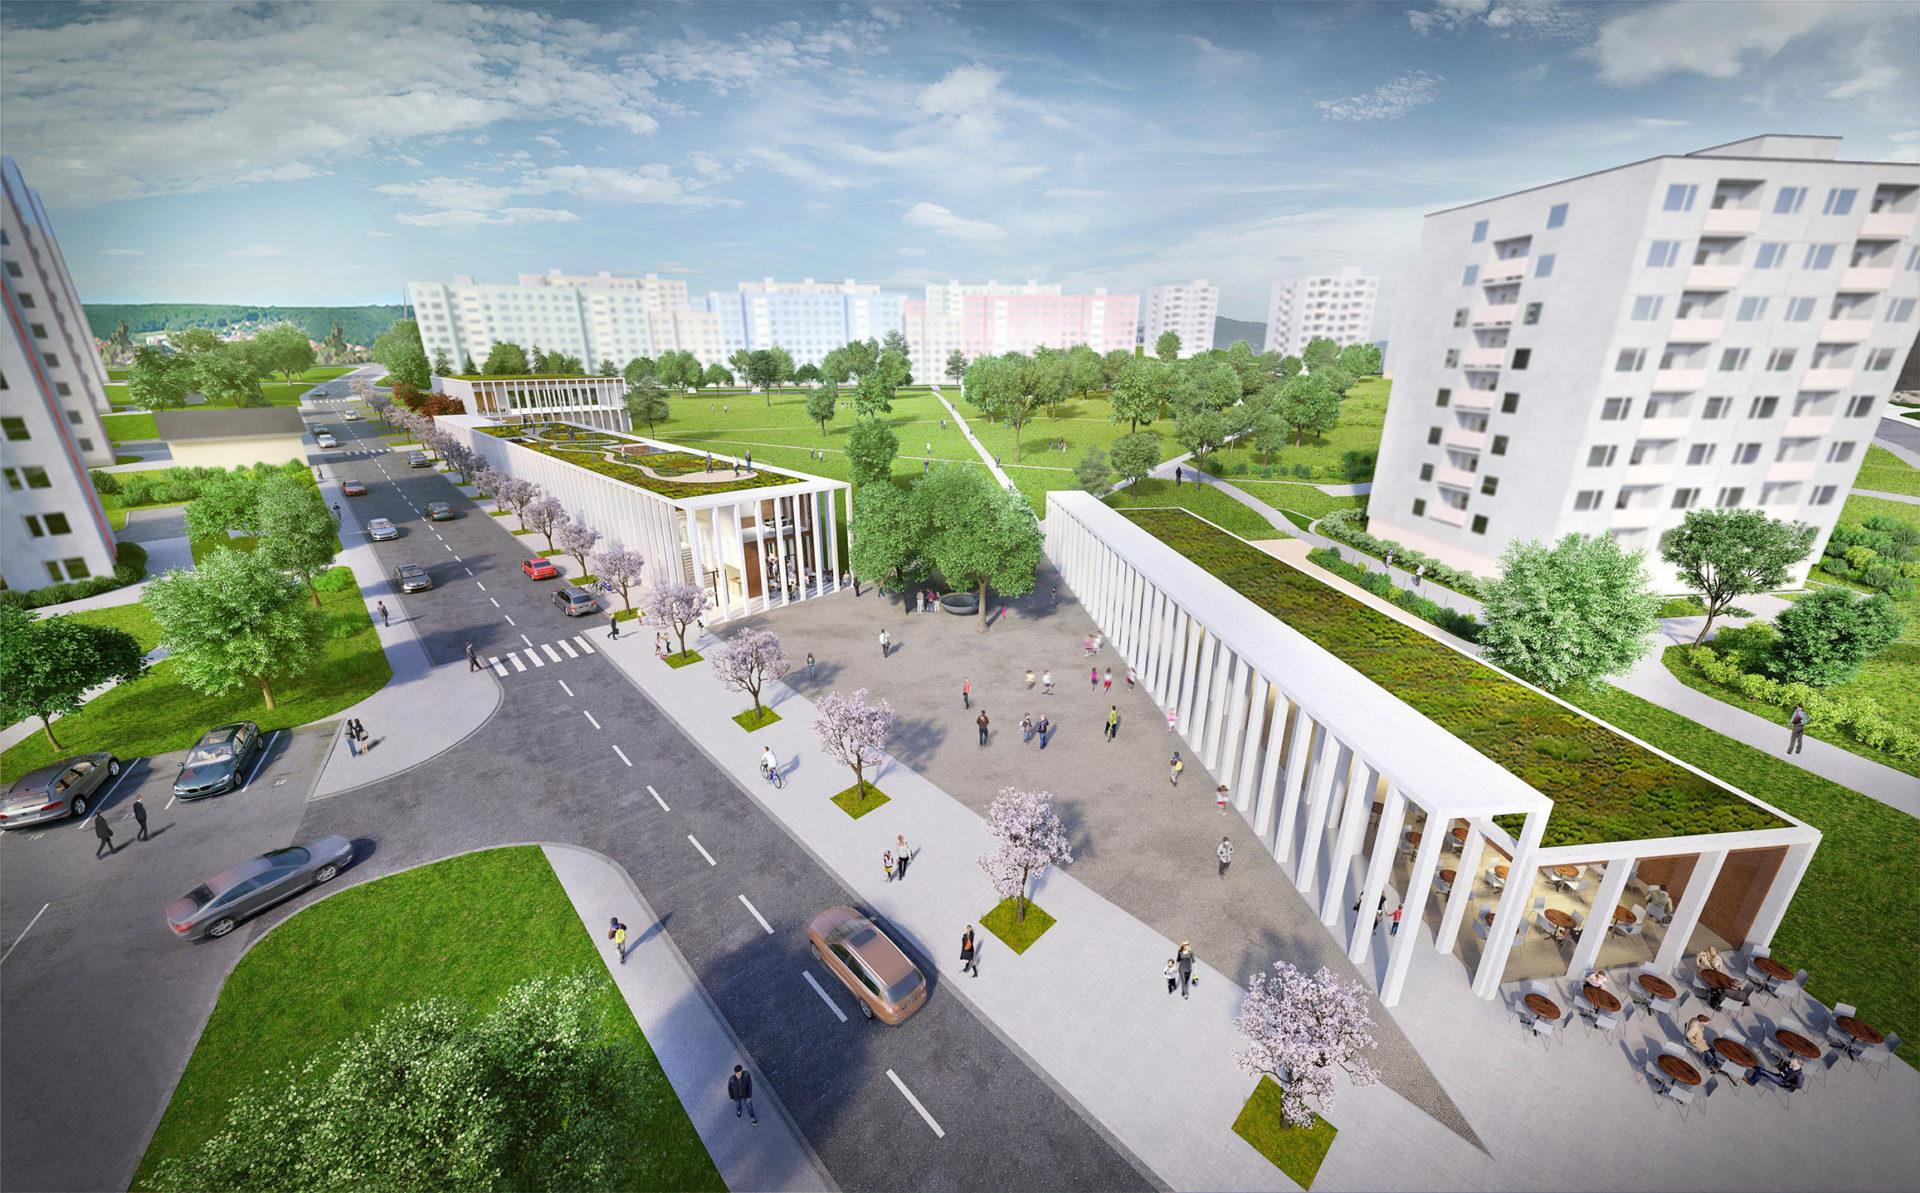 New Building of Community Center Bystrouška, Brno-Bystrc